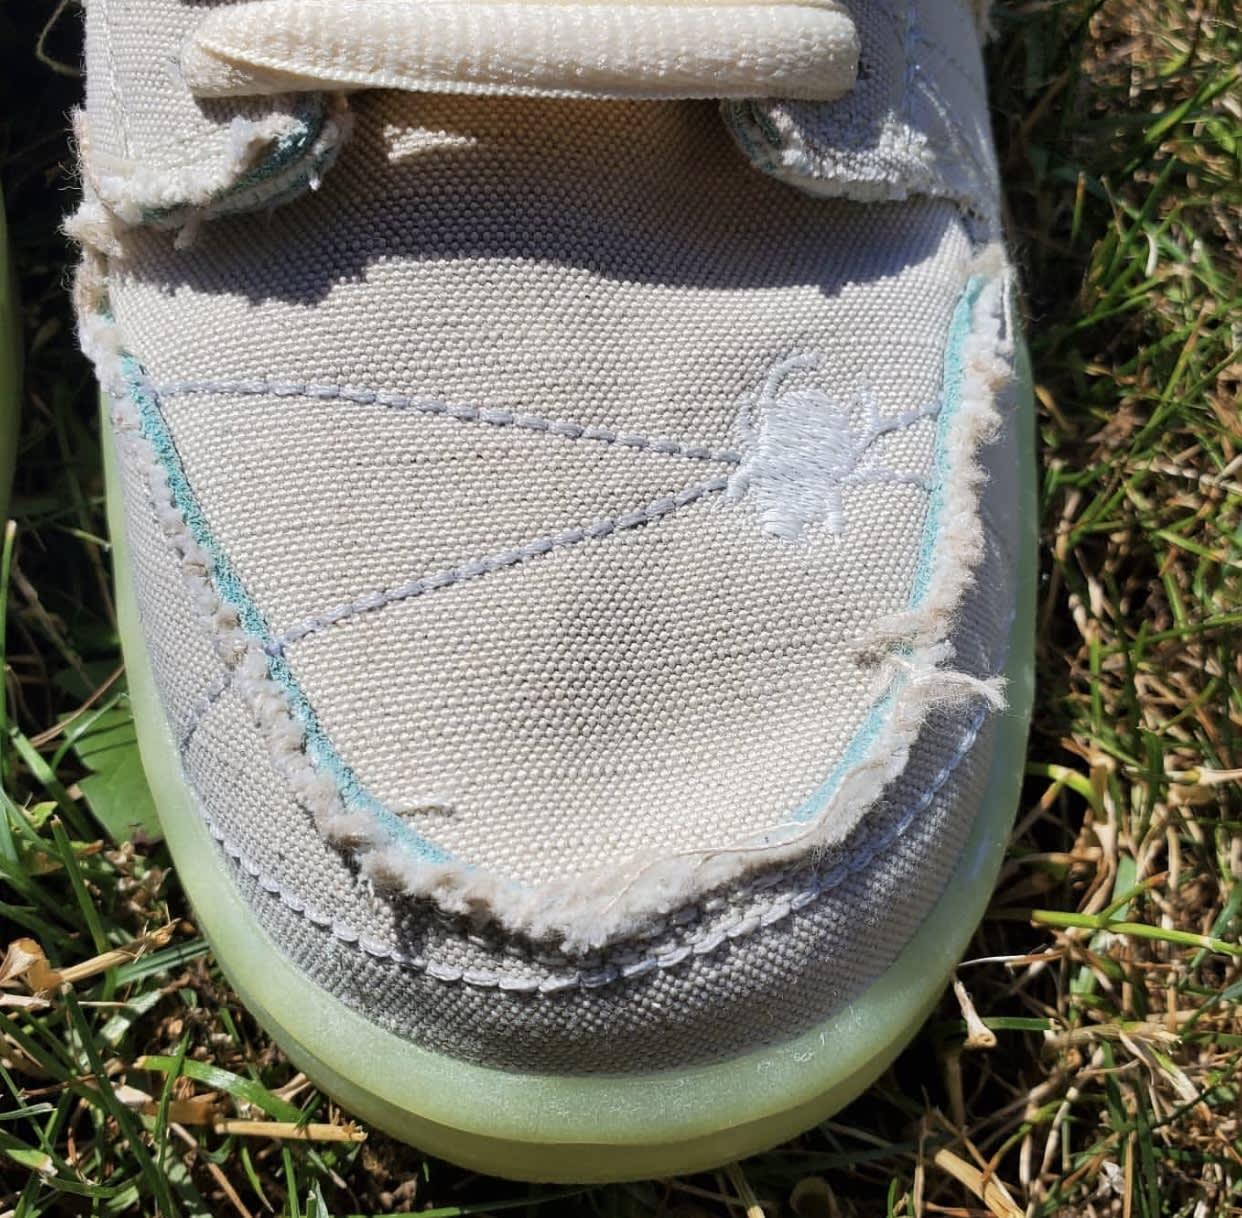 Nike SB Dunk Low Mummy Halloween DM0774-111 Toe